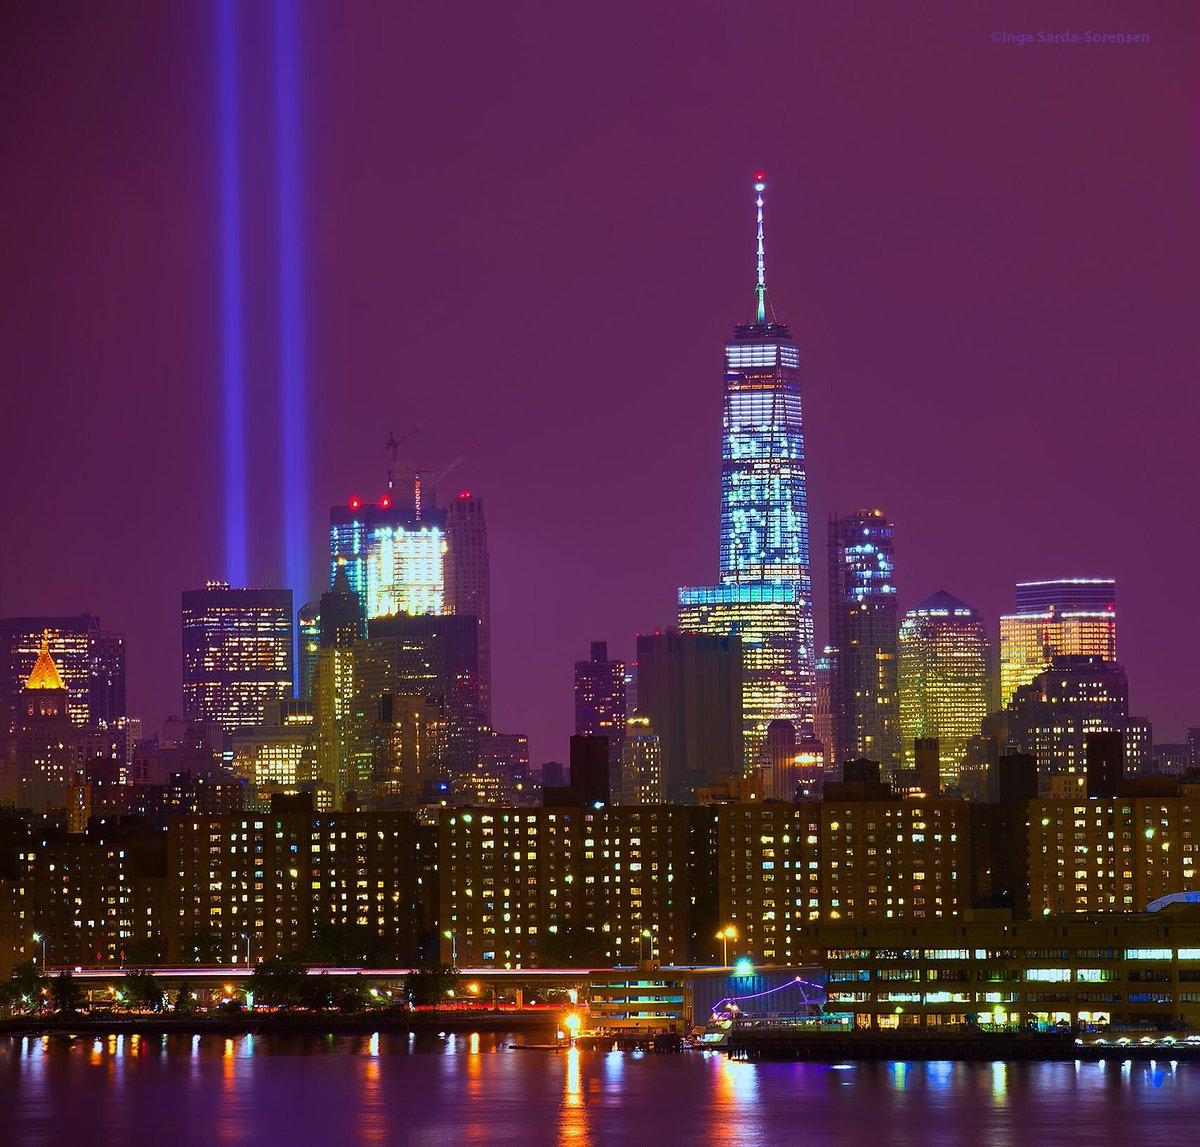 #TributeInLight test illuminates the sky in remembrance of 9/11. : @isardasorensen<br>http://pic.twitter.com/4ImnWJYIQQ